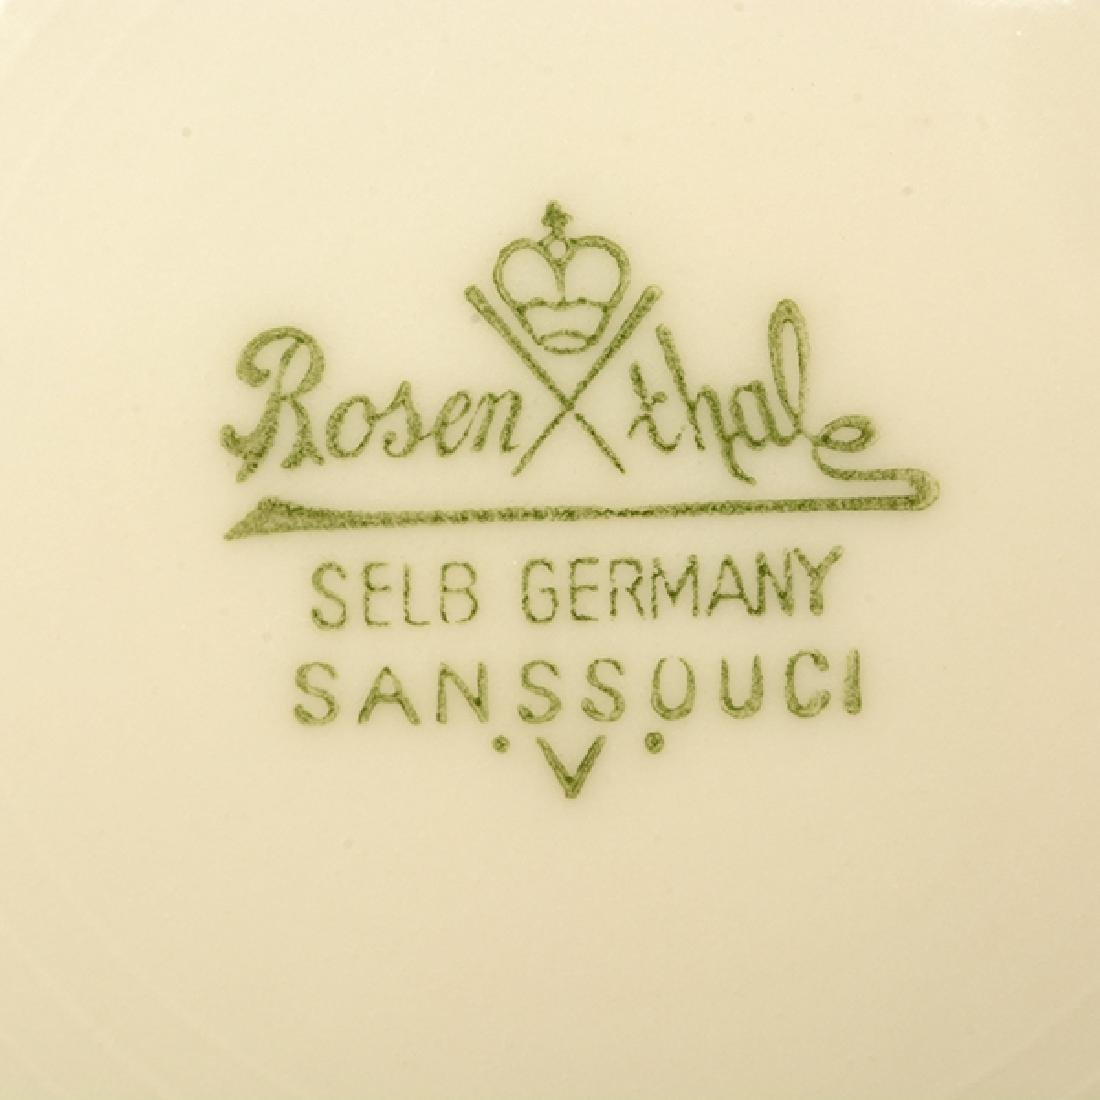 Rosenthal Sans Souci Porcelain Dinner Service - 5